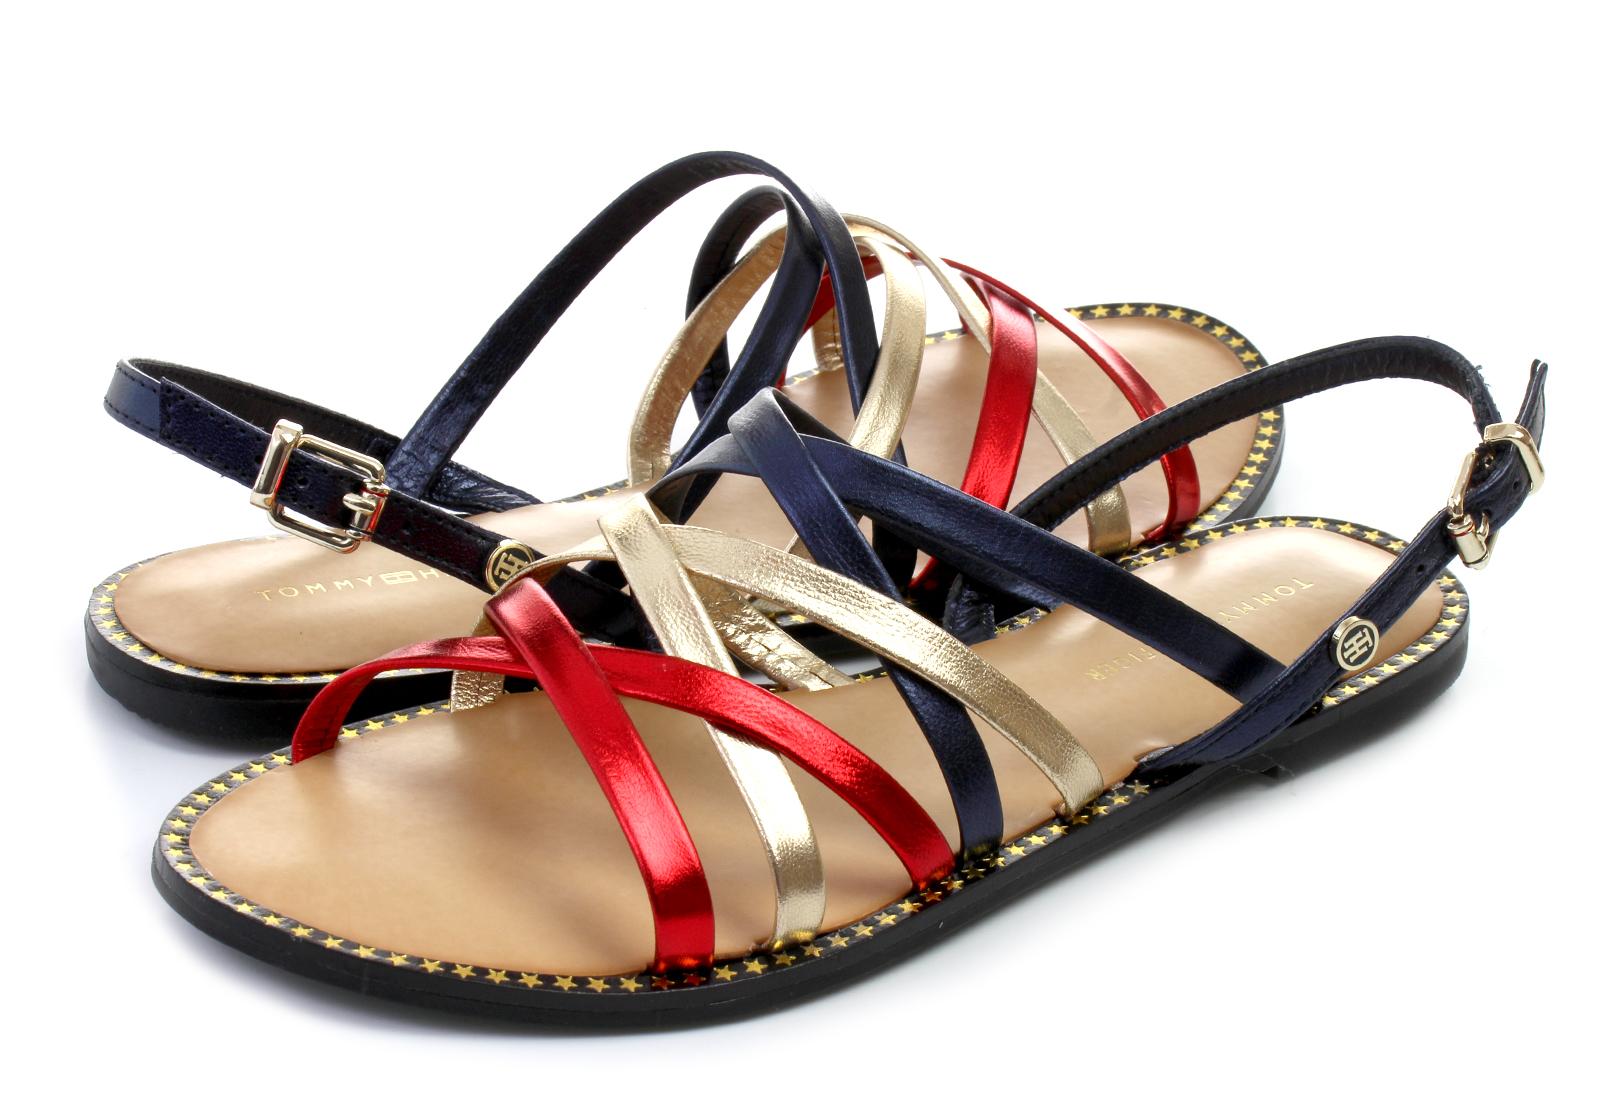 cb0df7c3afc8 Tommy Hilfiger Ravne Plave Sandale - Julia 76 - Office Shoes ...